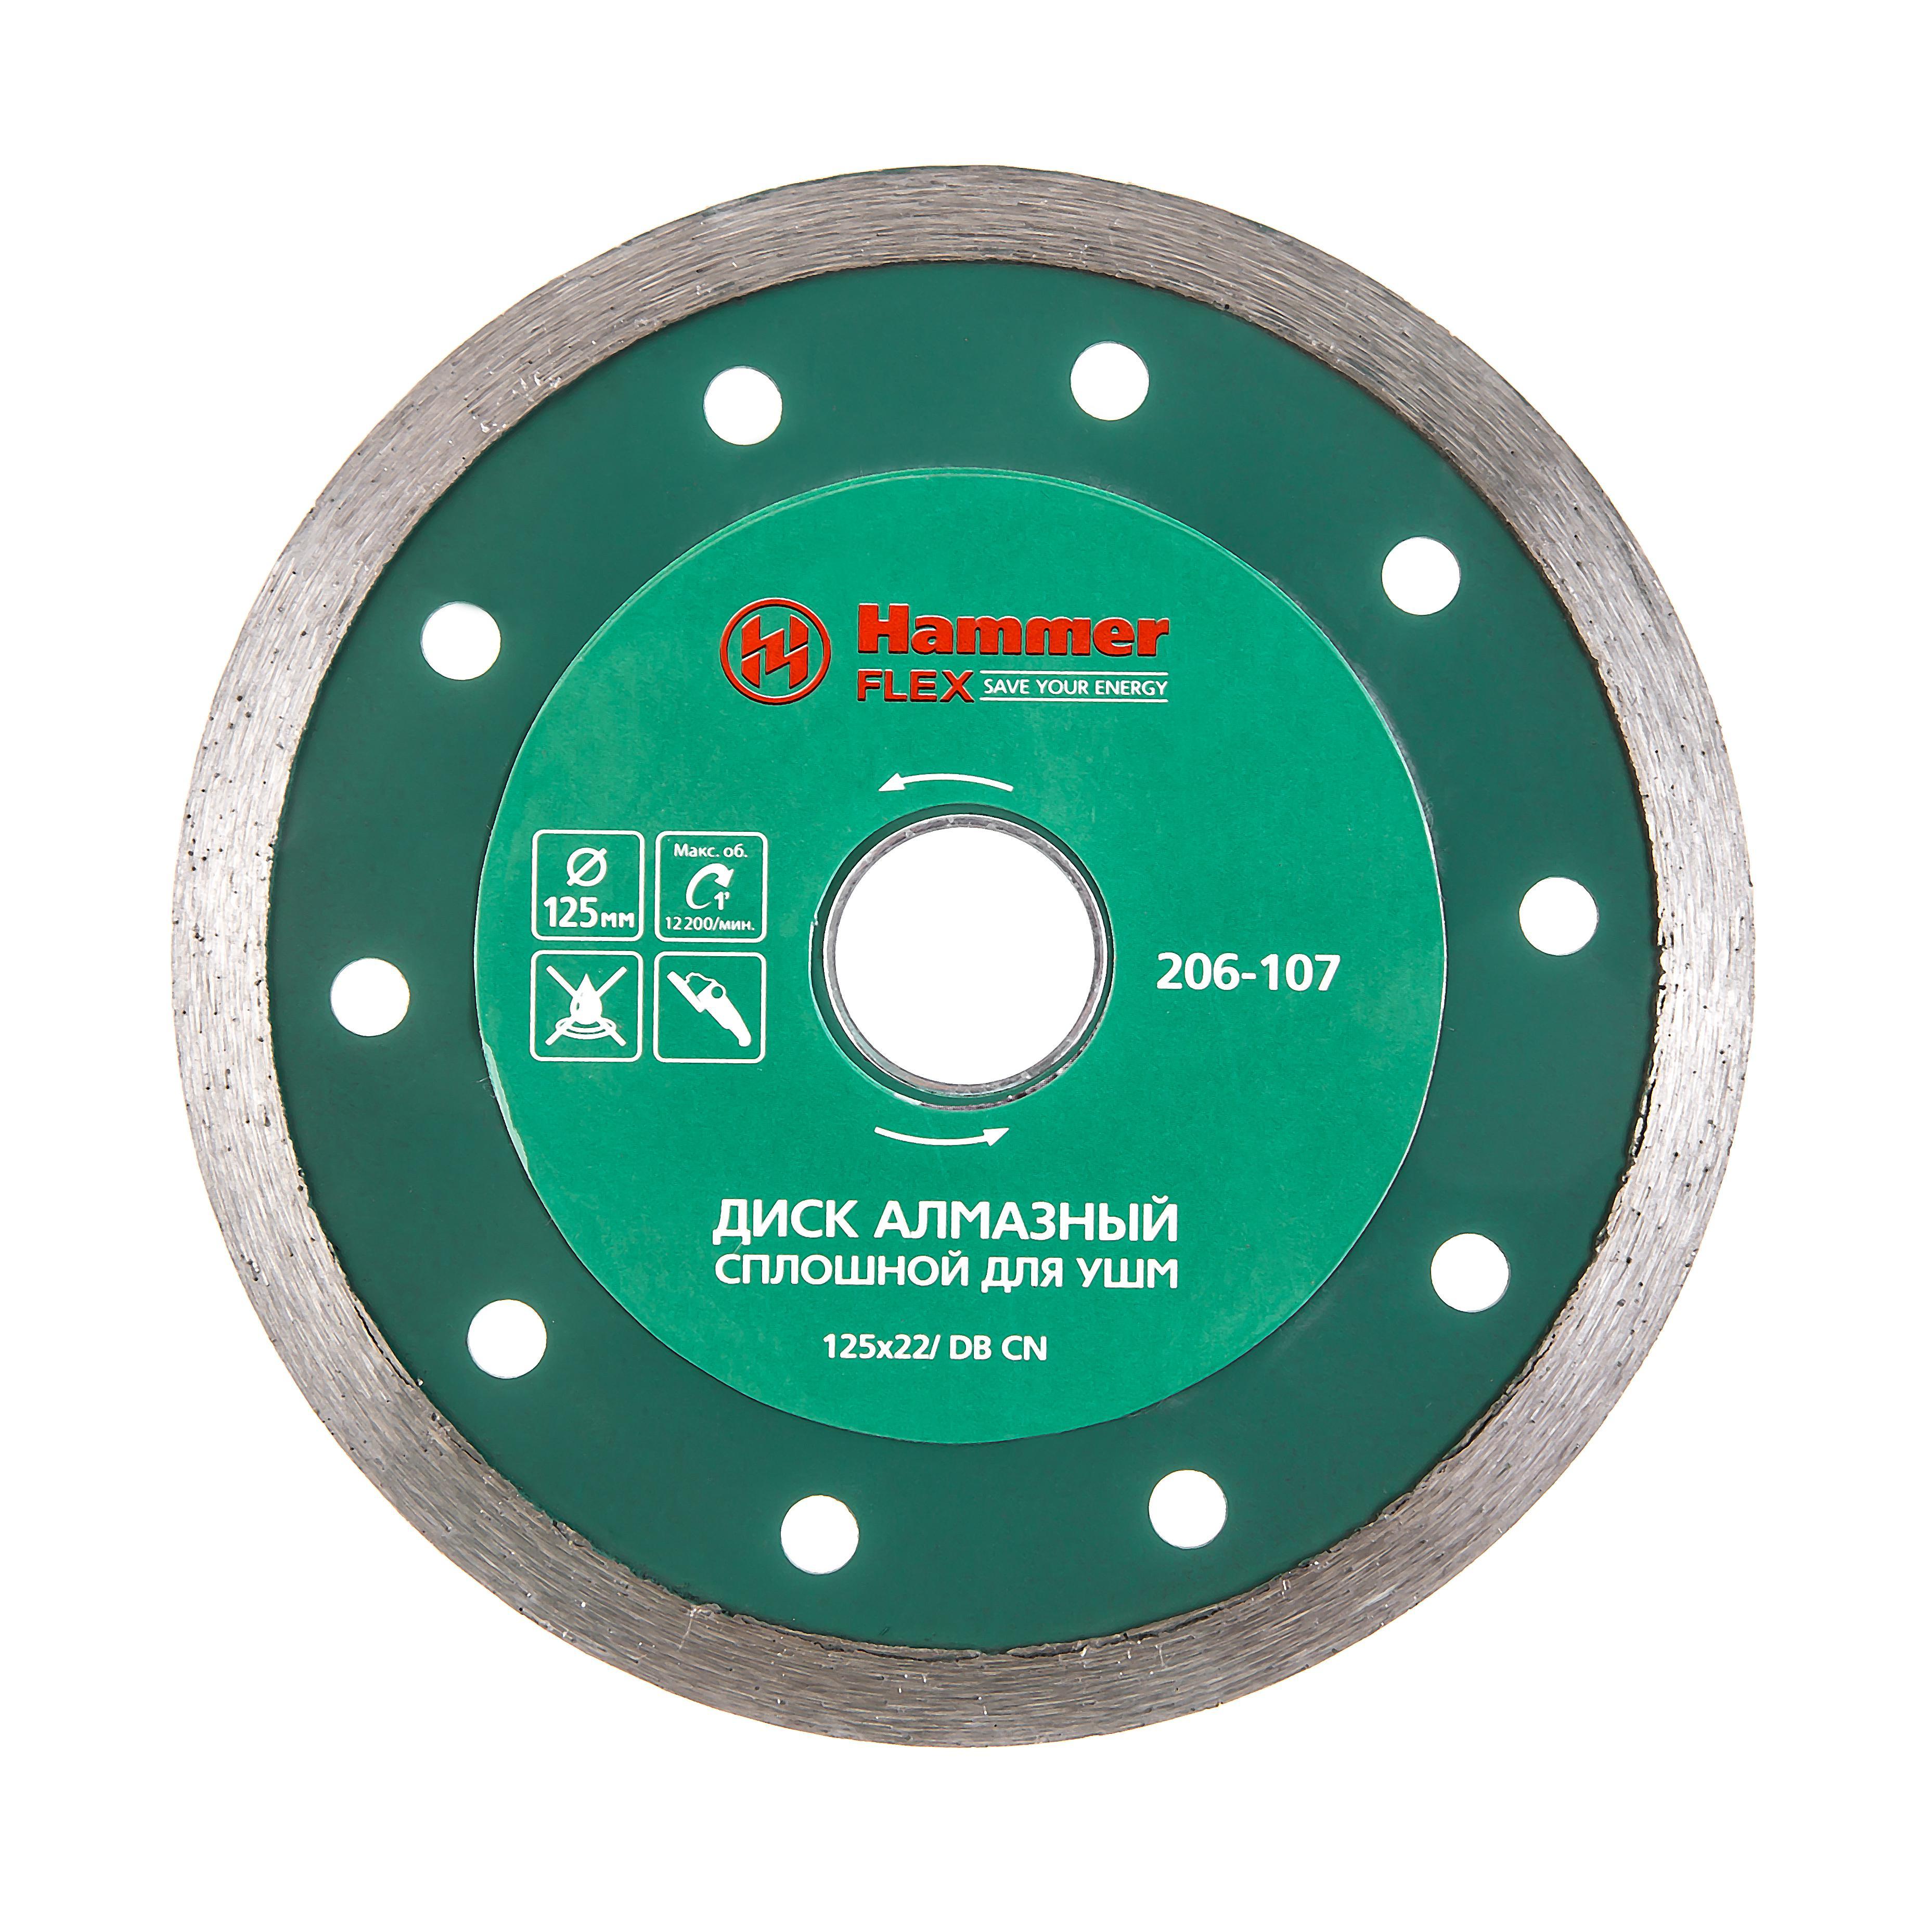 Круг алмазный Hammer 206-107 db cn цена